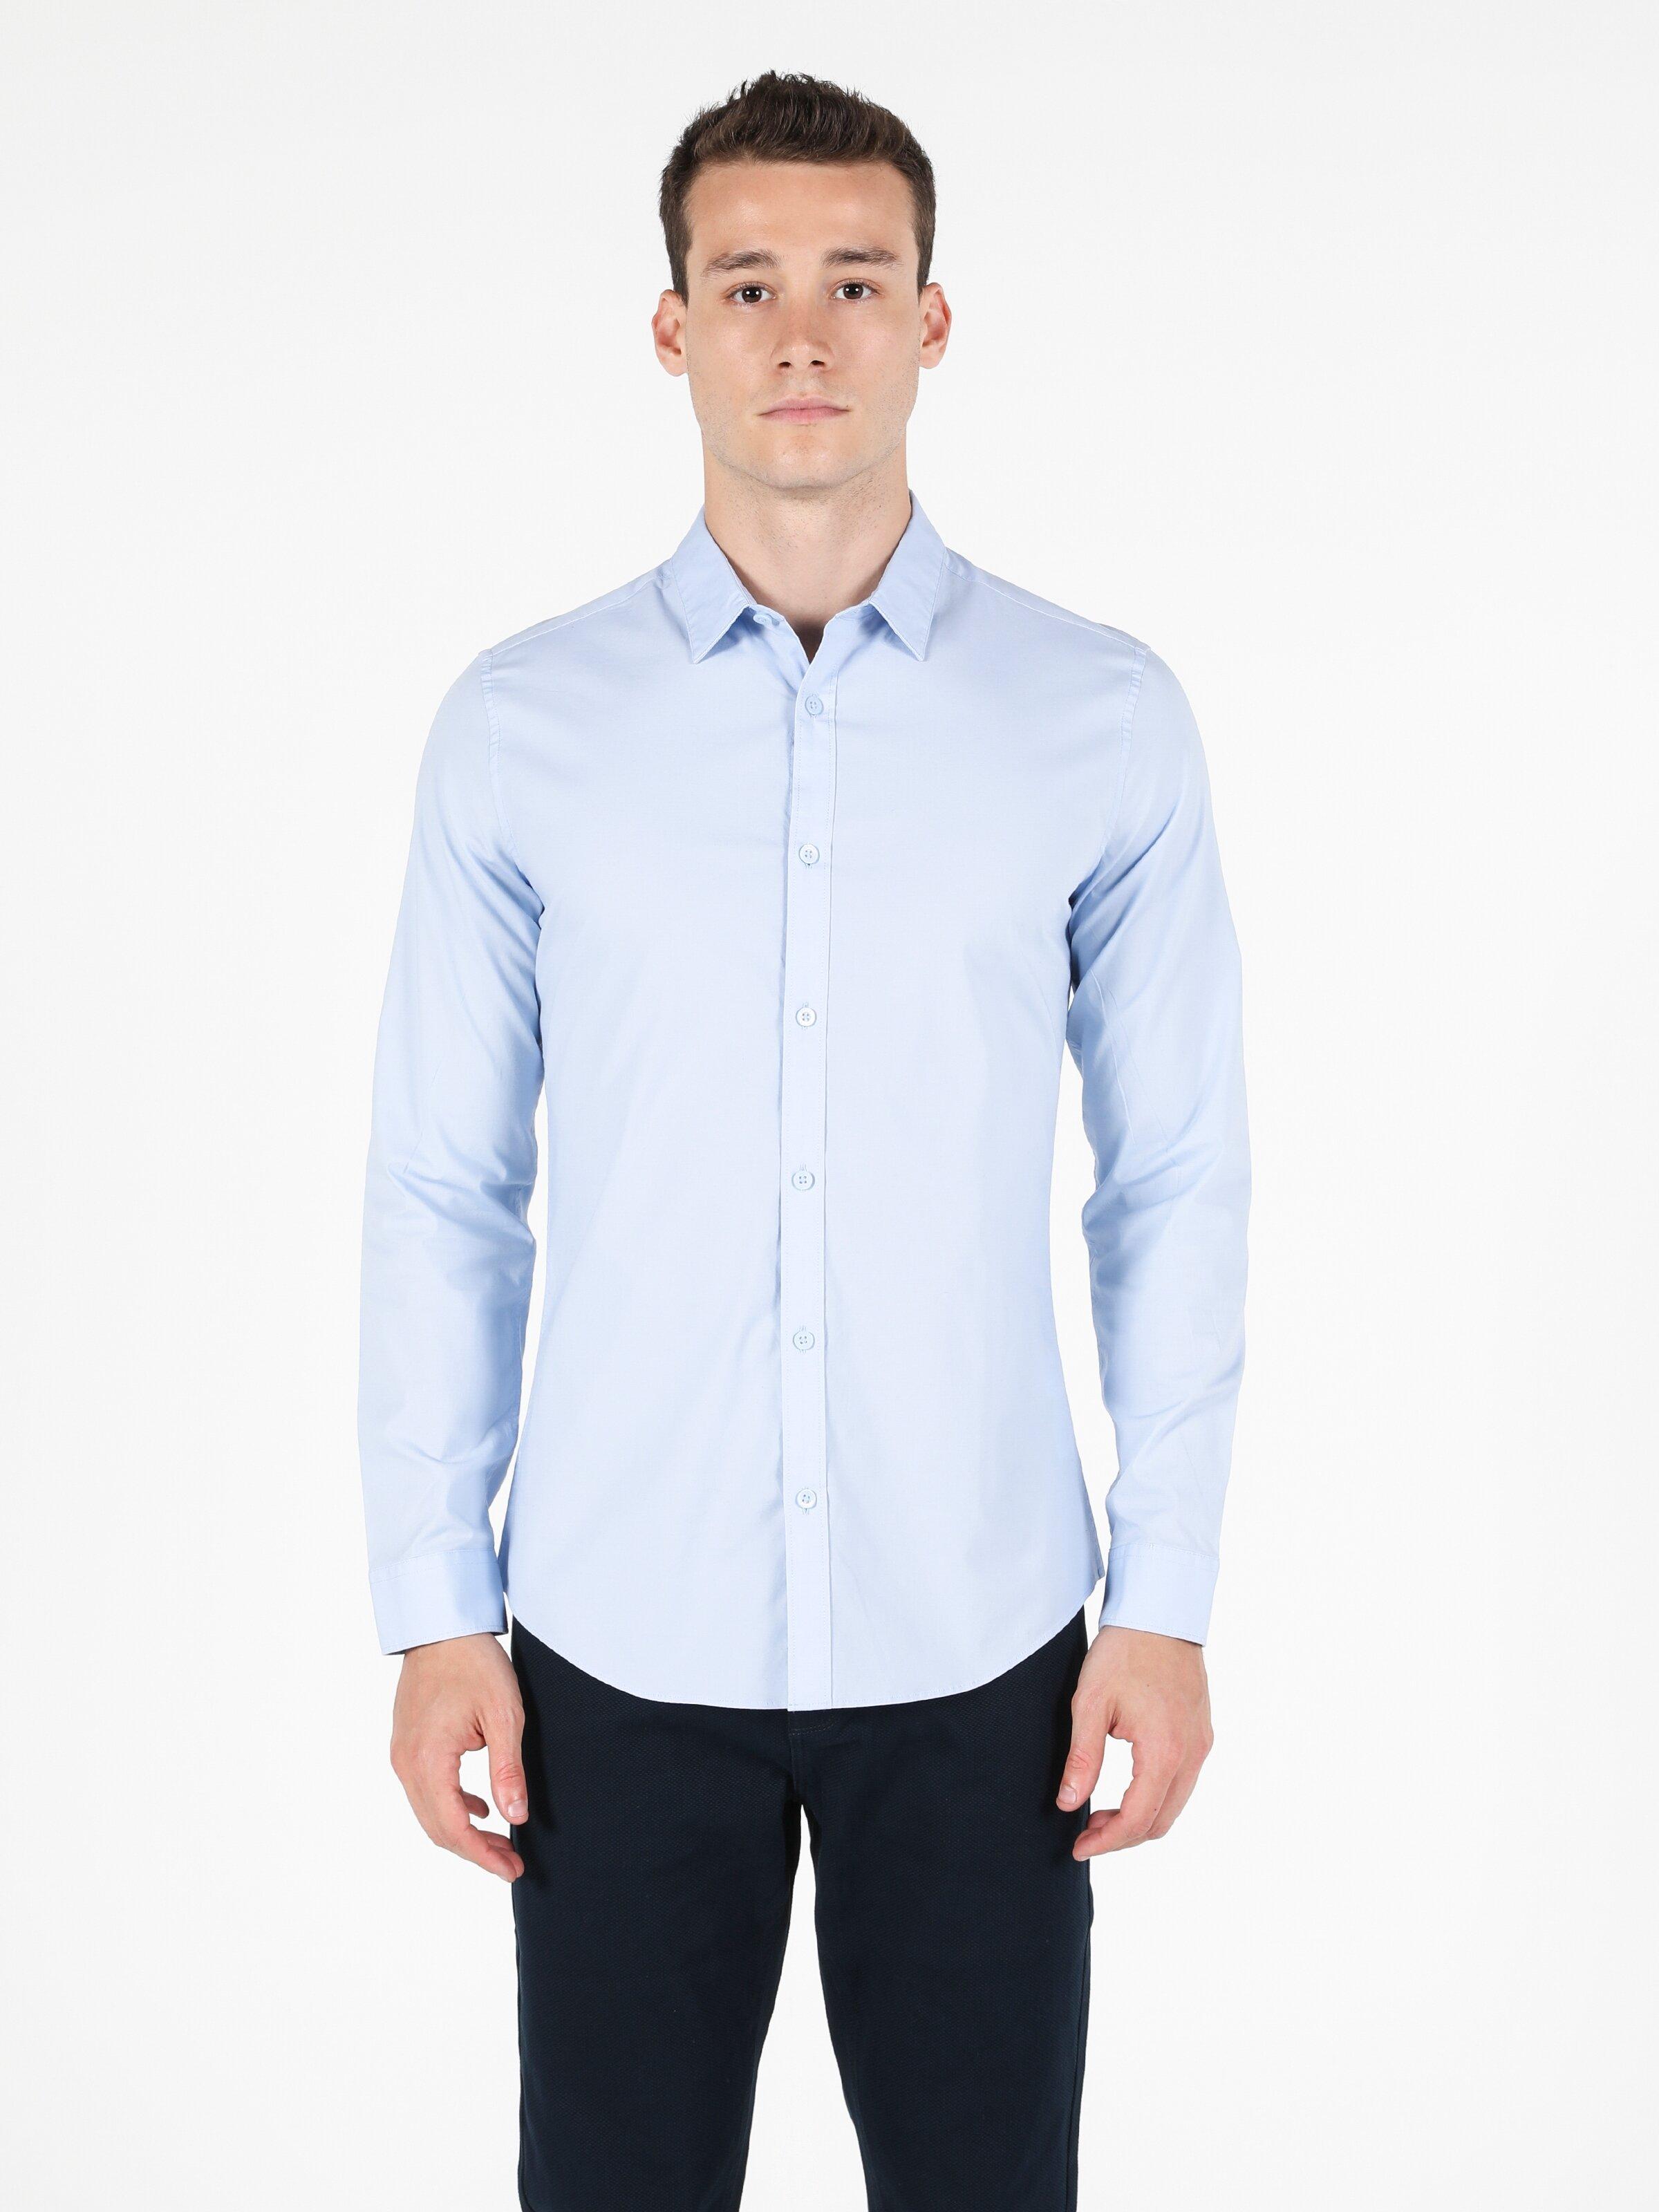 Super Slim Fit Shirt Neck Erkek Açık Mavi Uzun Kol Gömlek